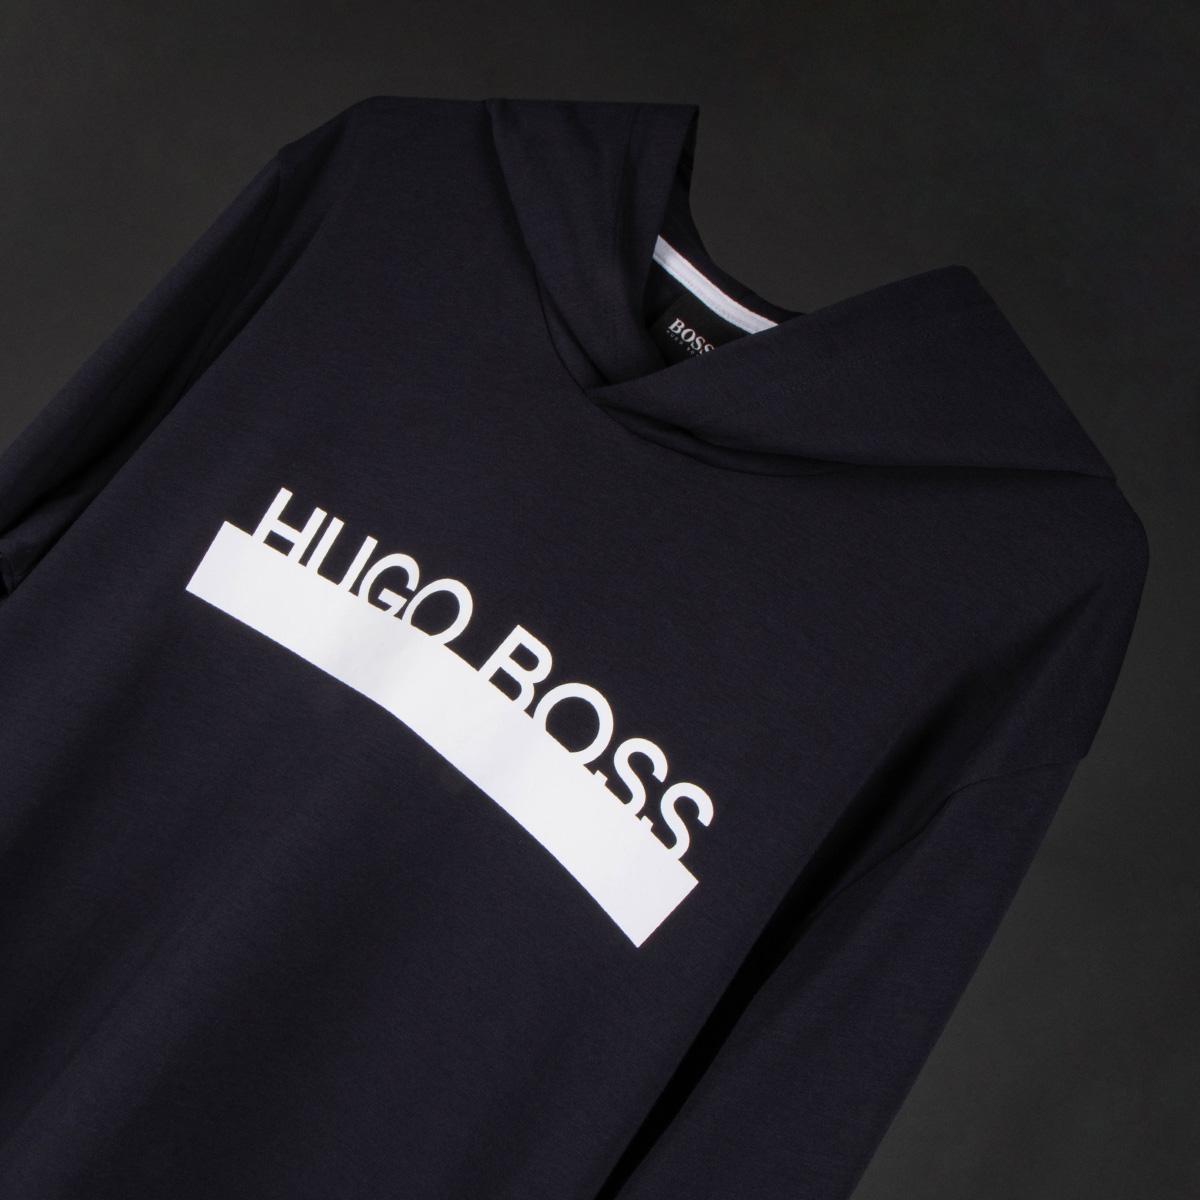 Lightweight lounge-wear courtesy of Boss. Shop the hoodie: https://mainlinem.co.uk/2vBx5vv #Boss #HugoBoss #BossHugoBoss #Menswear #MensFashion #MensClothing #DesignerMenswear #MensStyle #MensApparelpic.twitter.com/a2wj132sYf